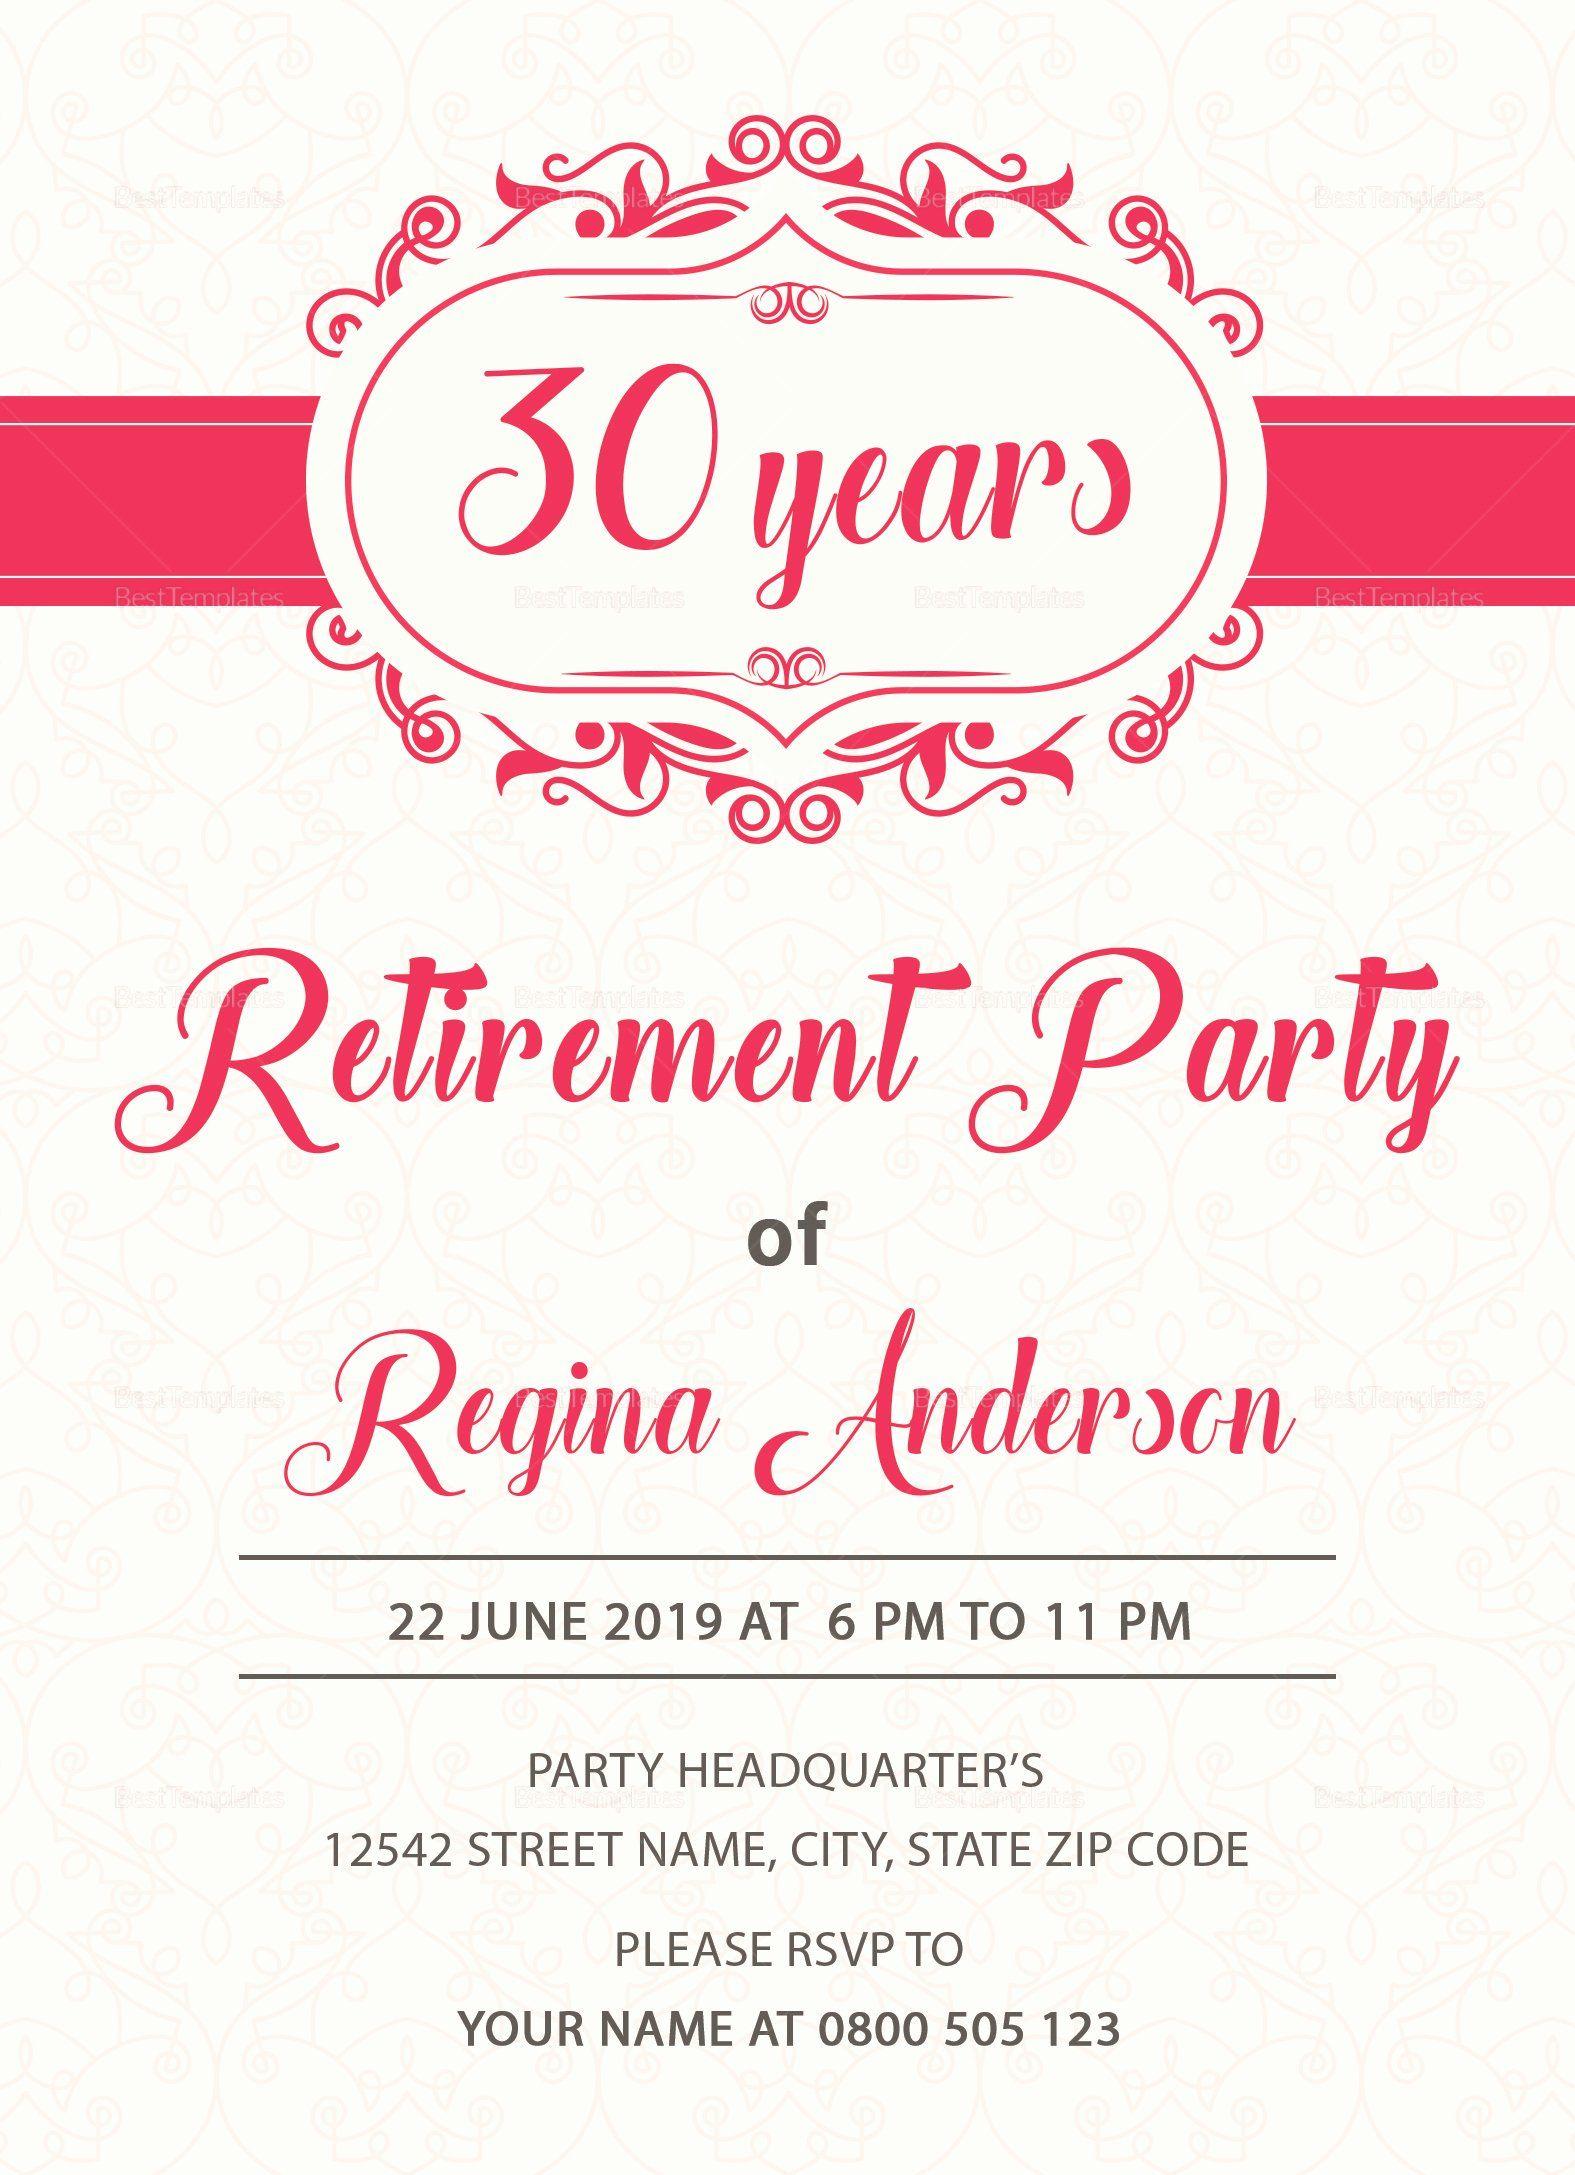 Retirement Party Invitation Templates Retirement Party Invitations Party Invite Template Retirement Invitation Template